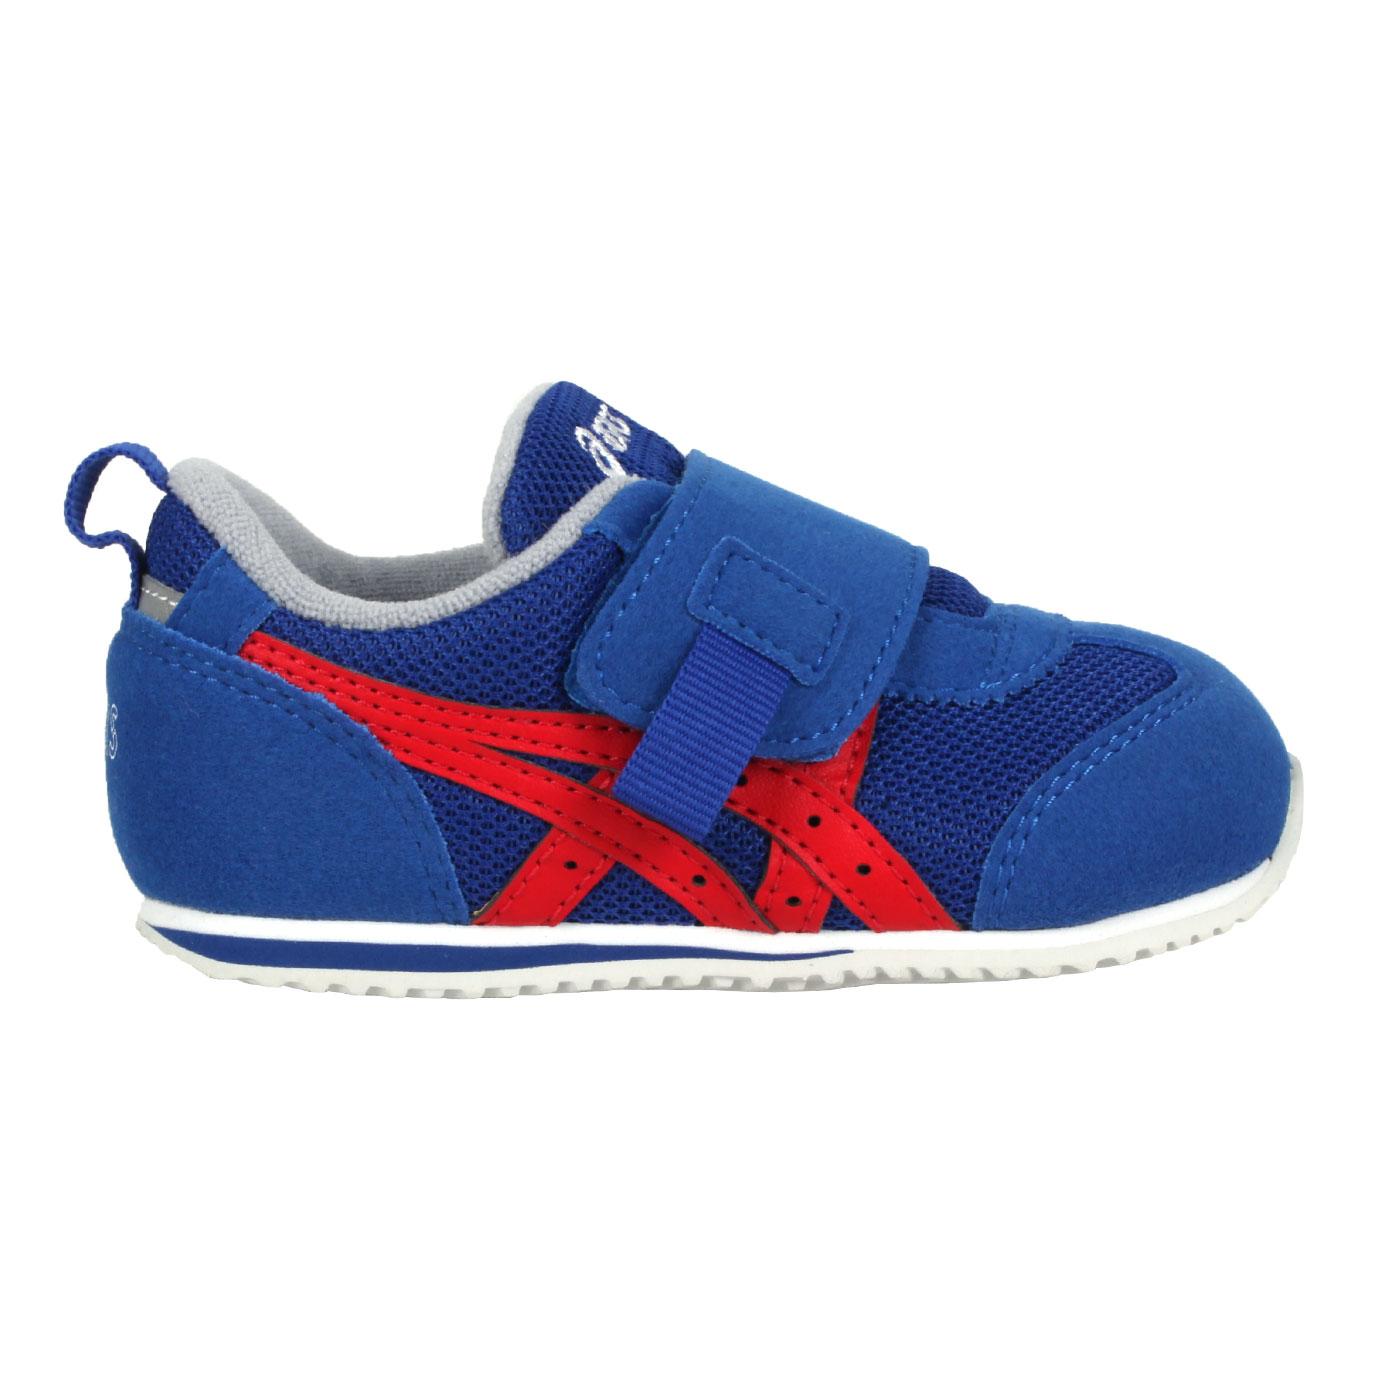 ASICS 小童休閒運動鞋  @IDAHO BABY OP@1144A158-400 - 藍紅